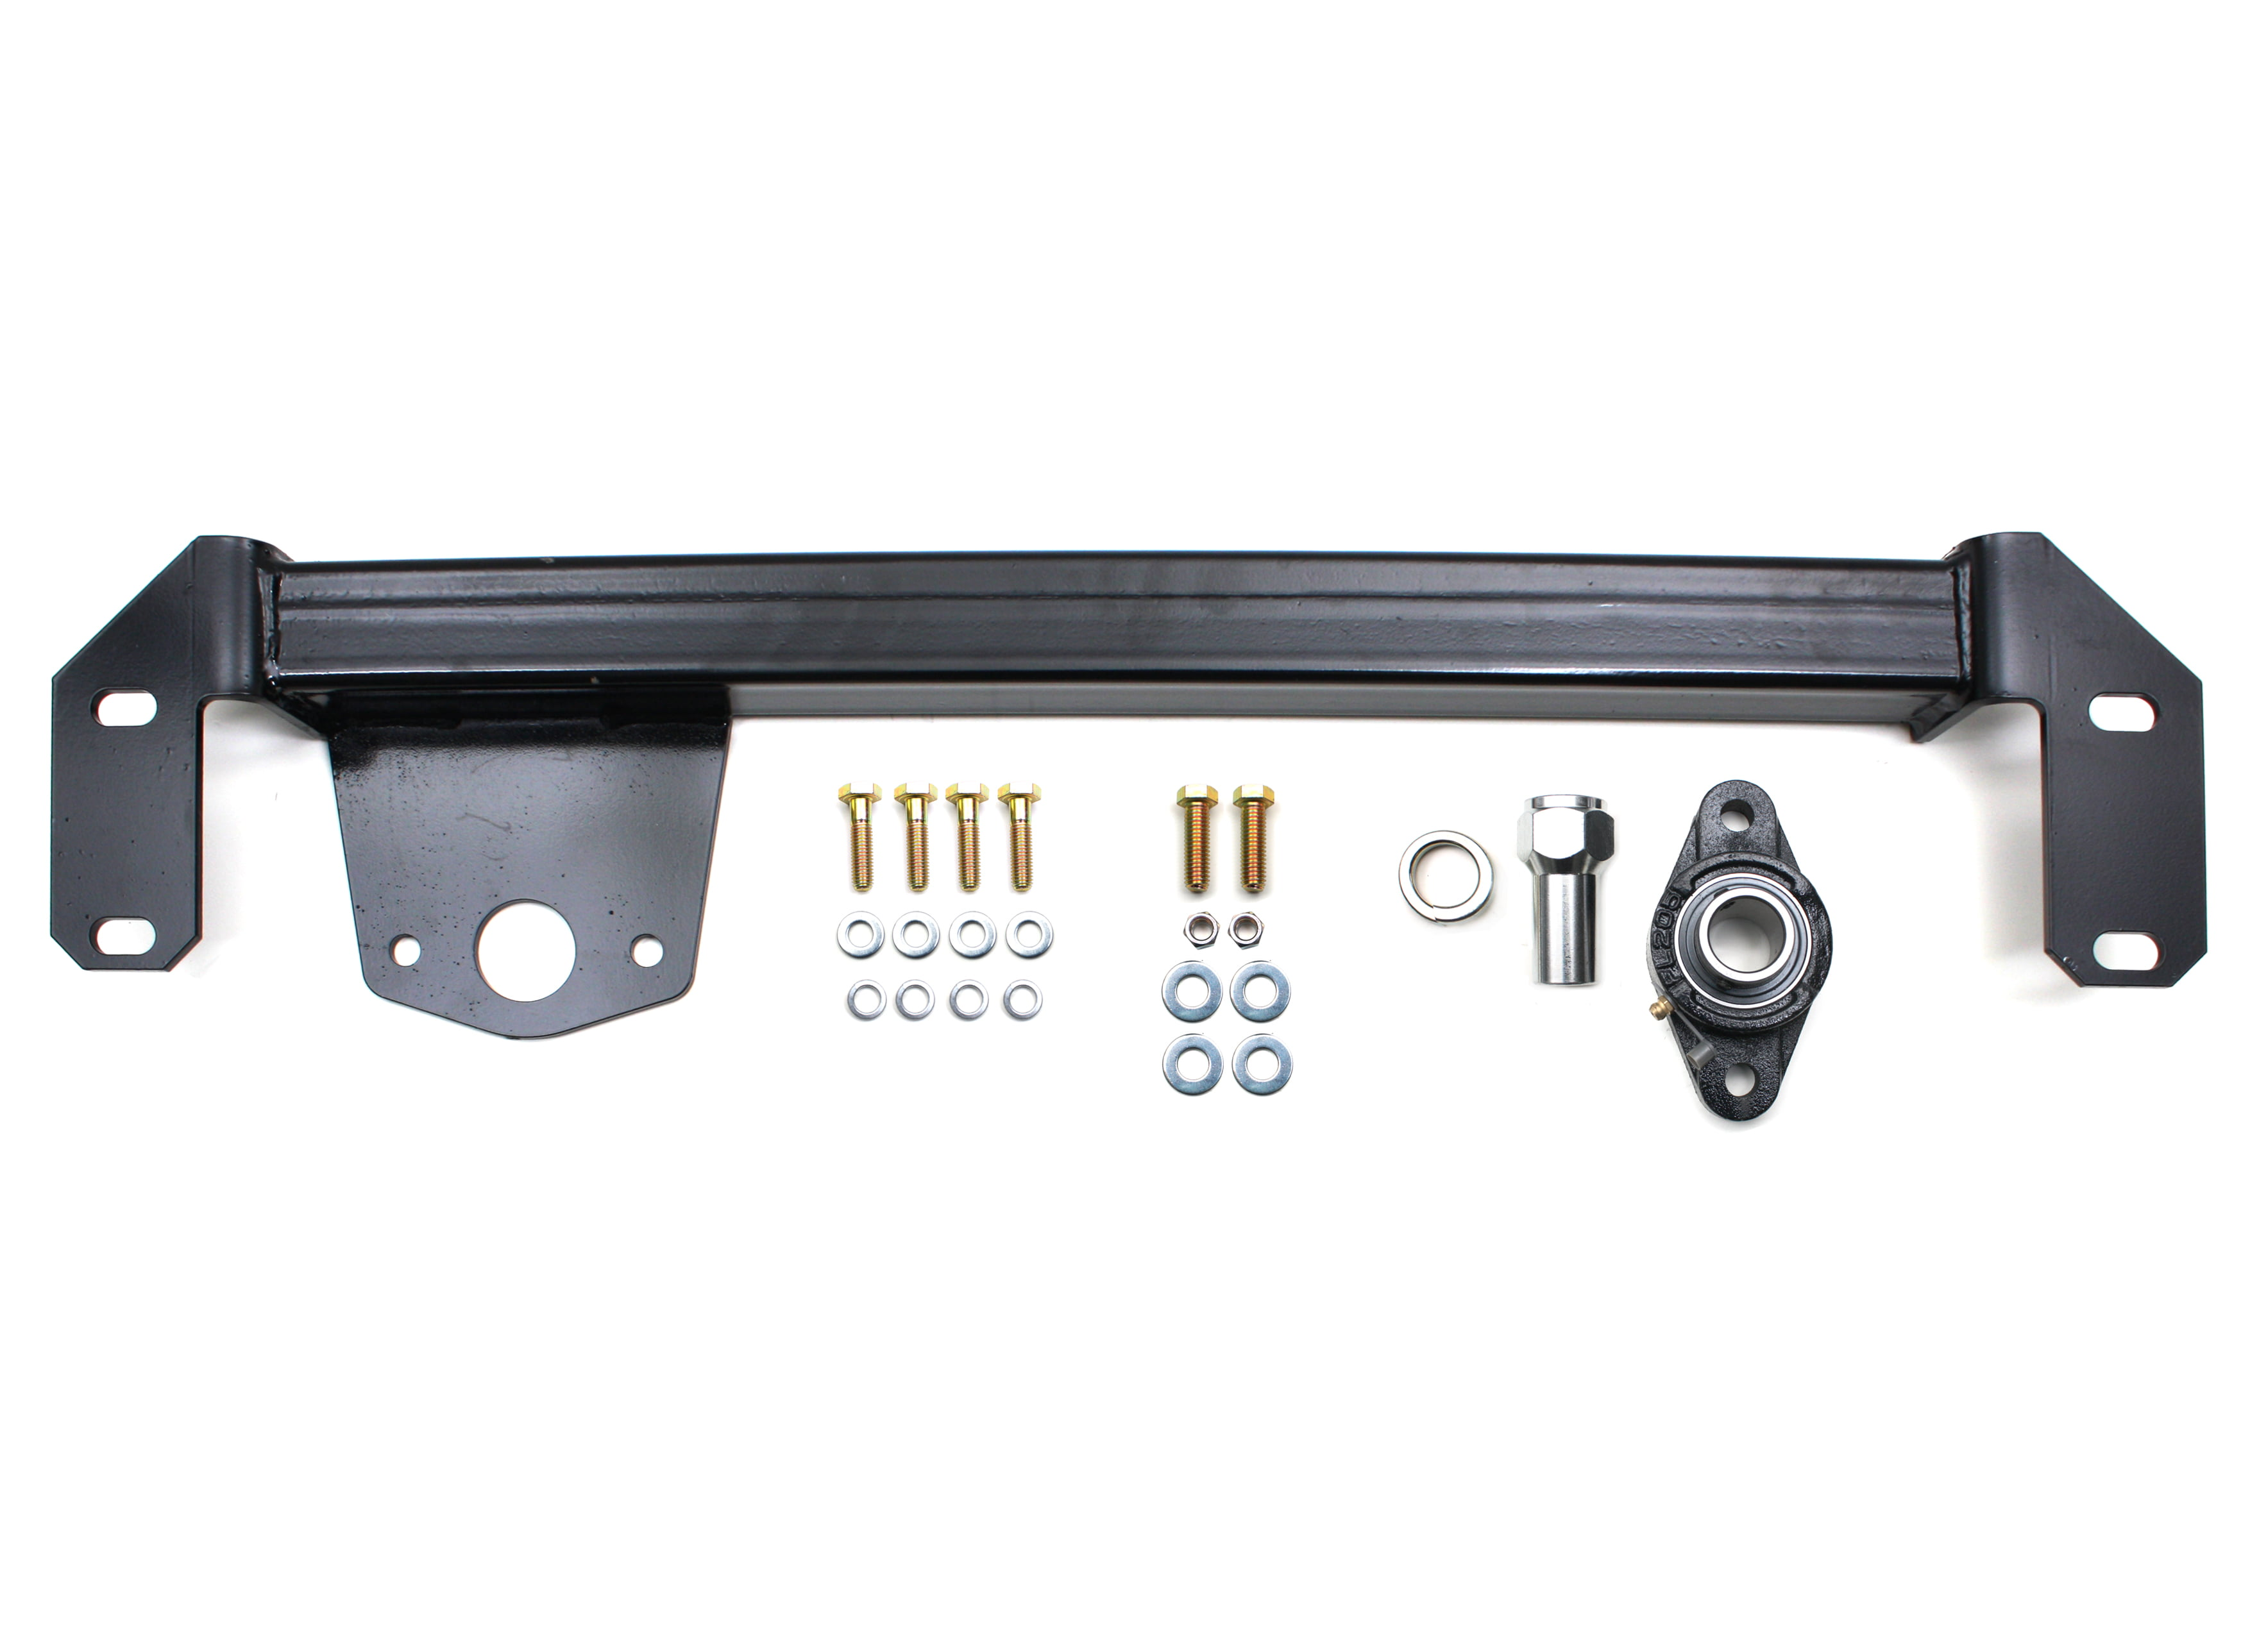 Steering Gear Box Stabilizer Bar For Dodge Ram 1500 2500 3500 4wd 4x4 Gasoline Diesel Walmart Com Walmart Com